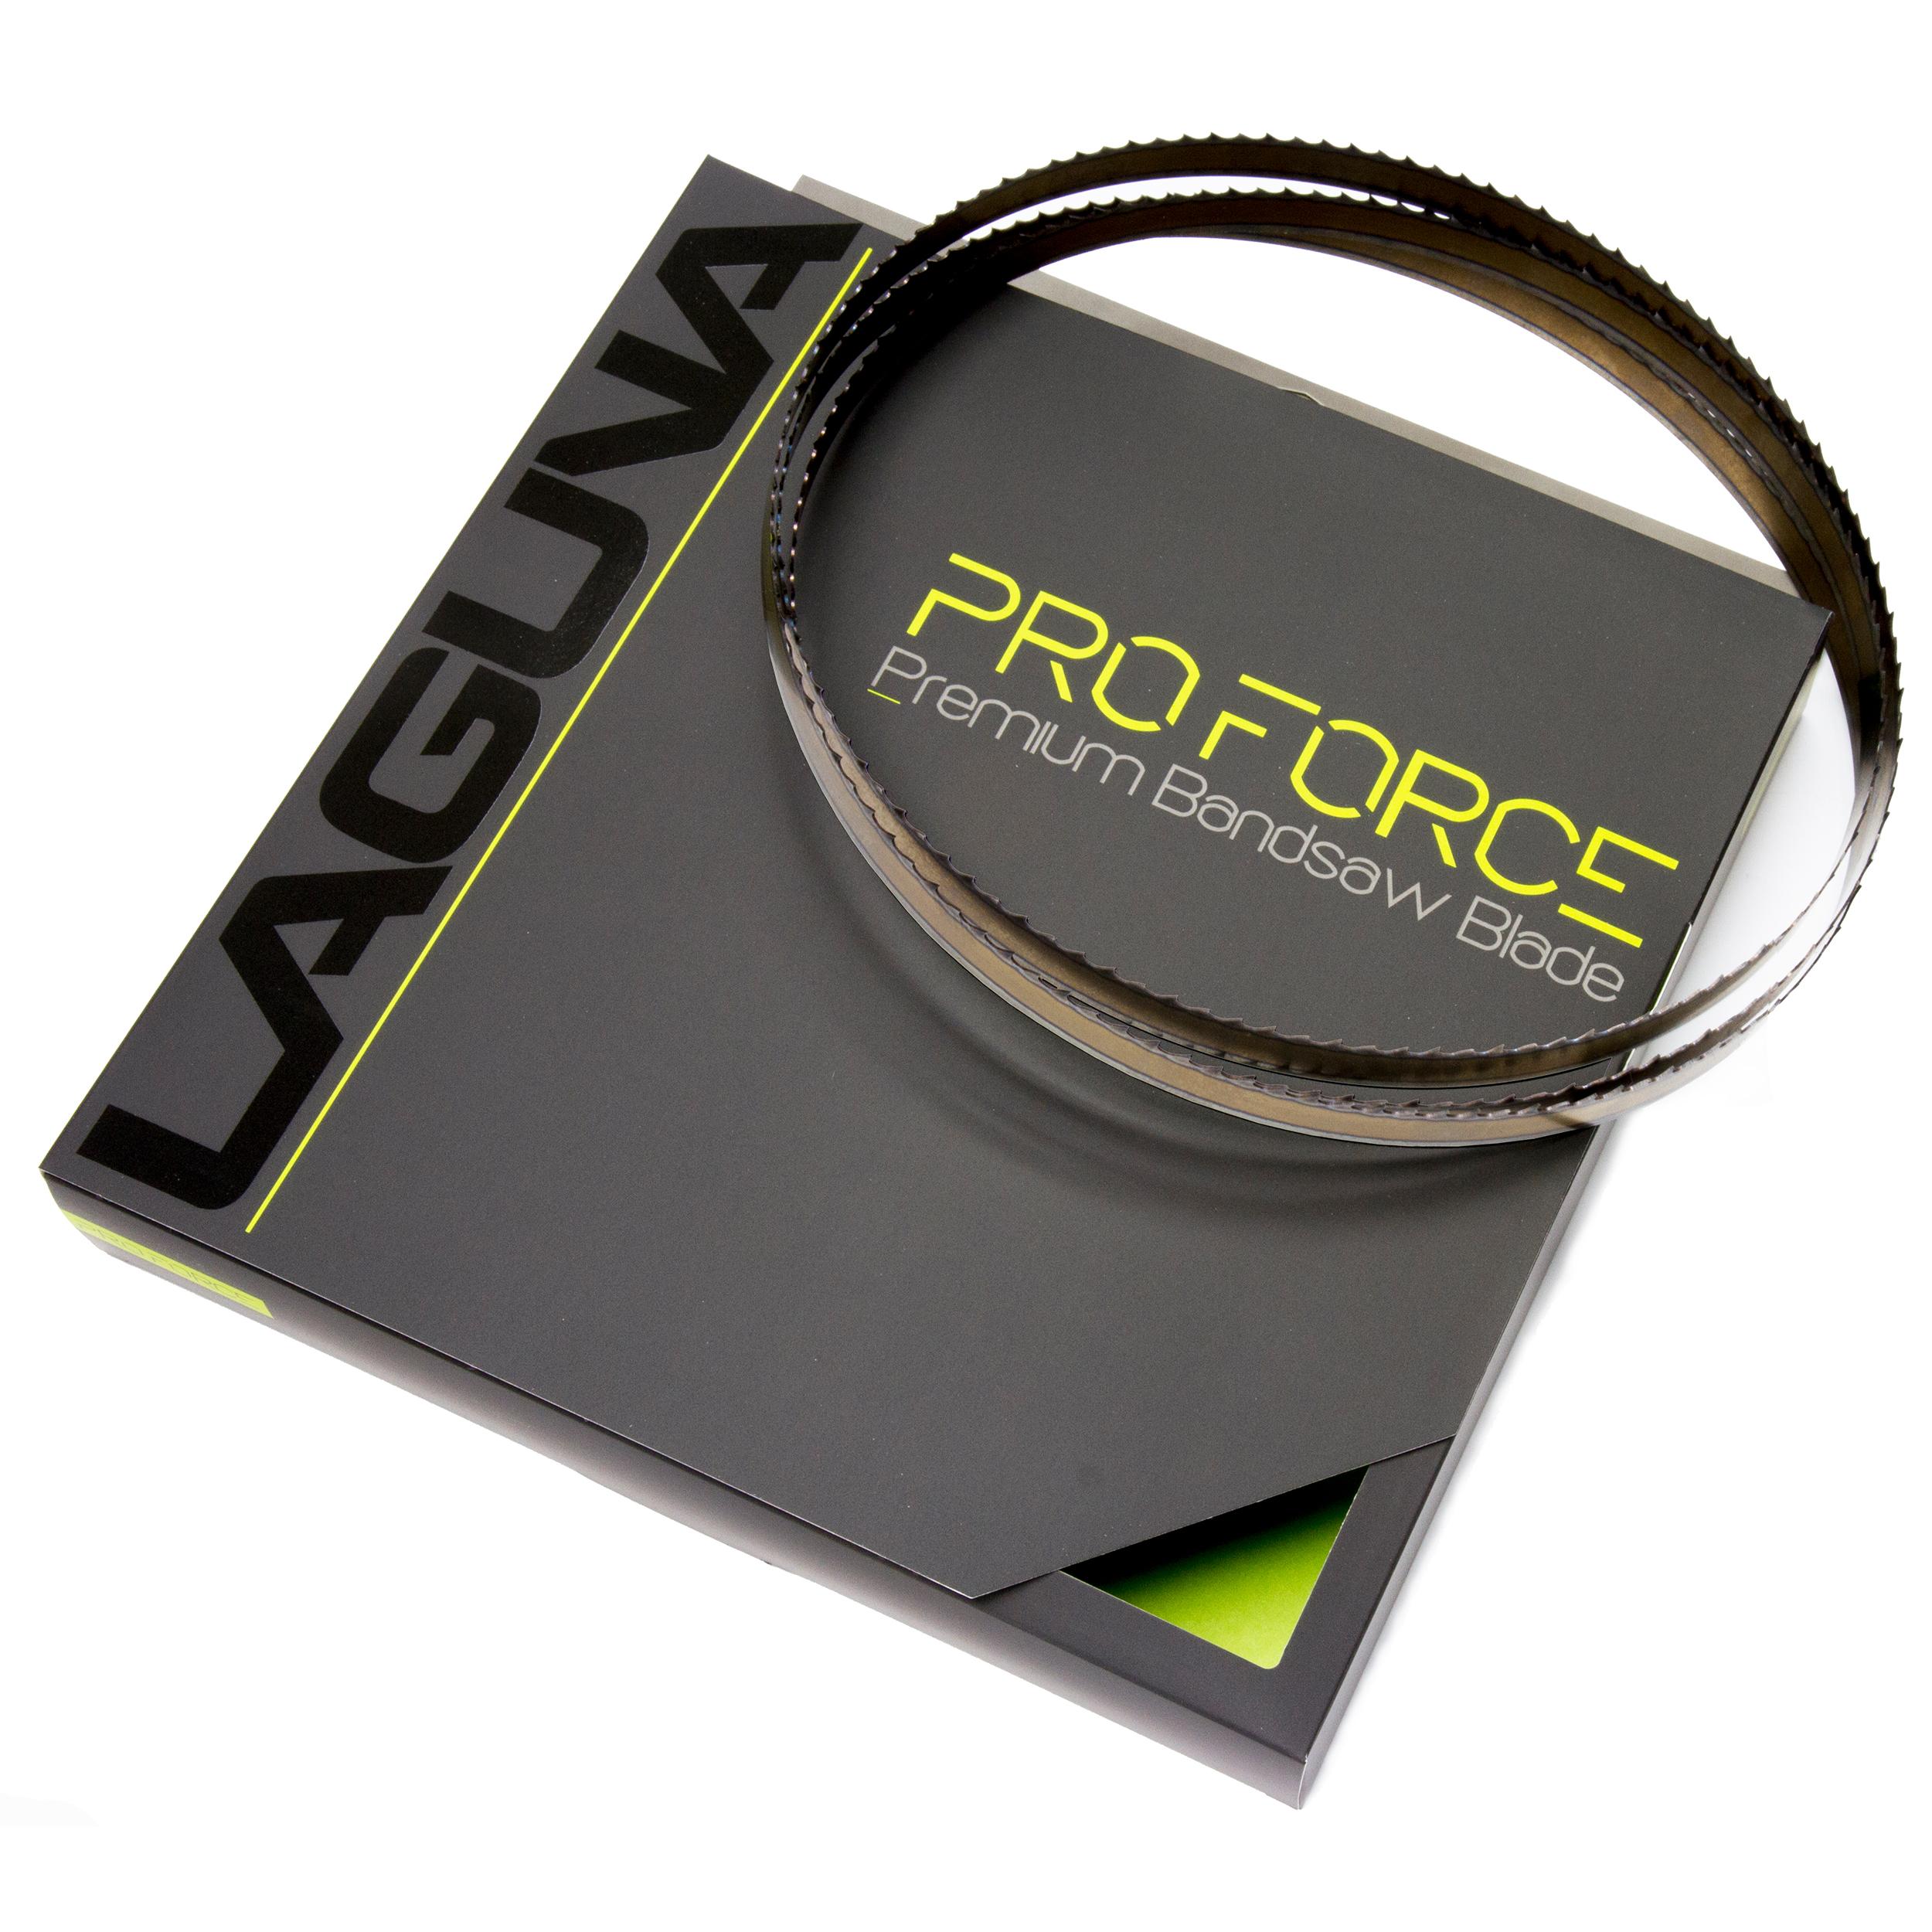 Pro Force 1 / 4